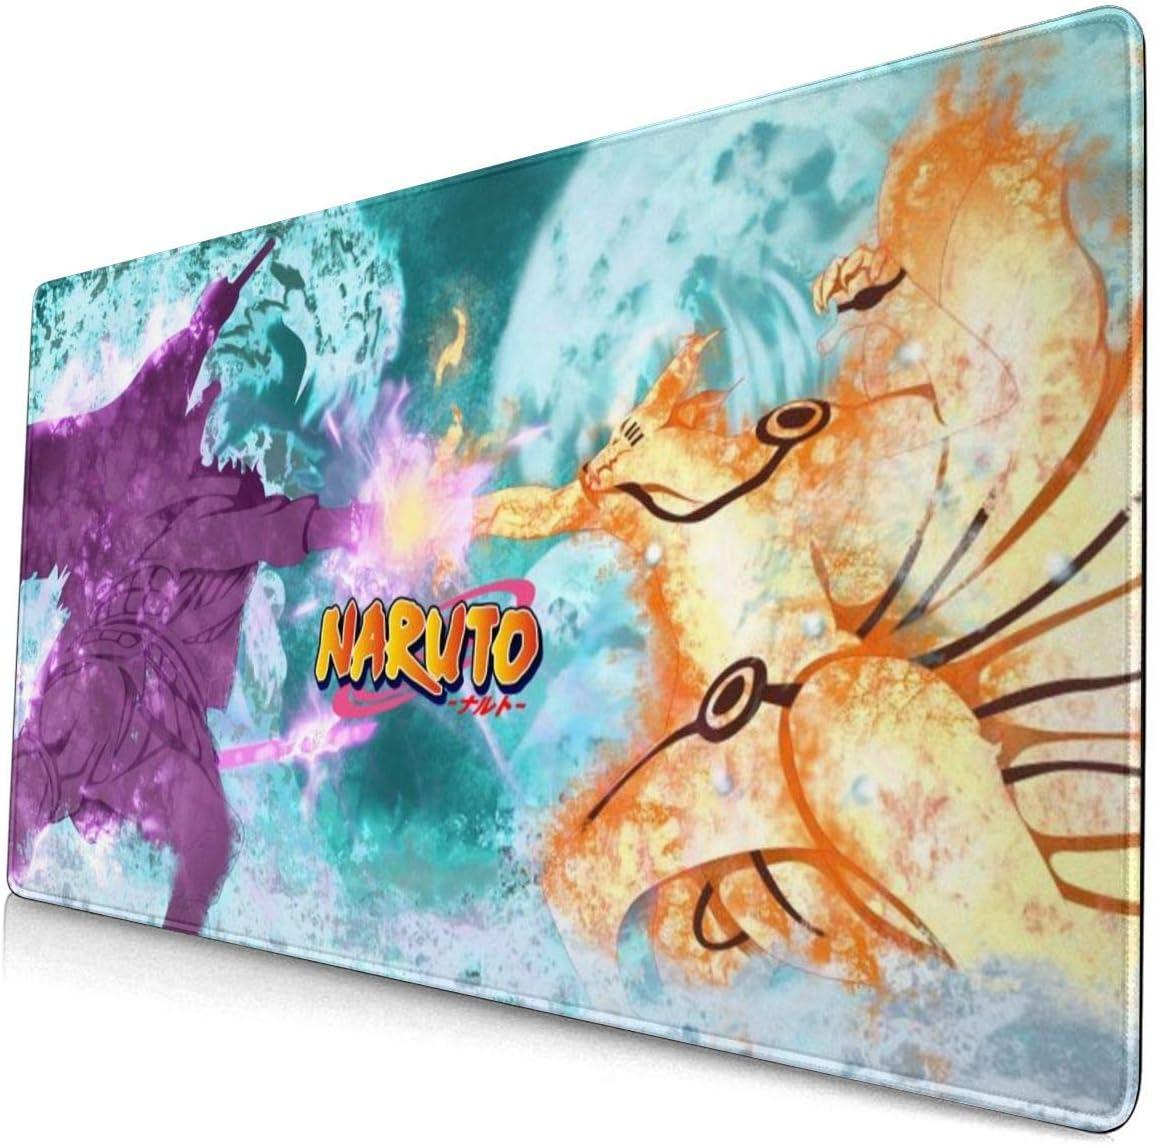 Cool Anti-Fray Gaming Mouse Pad with Stitched Edge, Anti-Slip Rubber Base, Waterproof Anime Naruto Naruto Uzumaki and Sasuke Uchiha Keyboard Pad Desk Mat, Classic Mouse Mat for Laptop Office Home